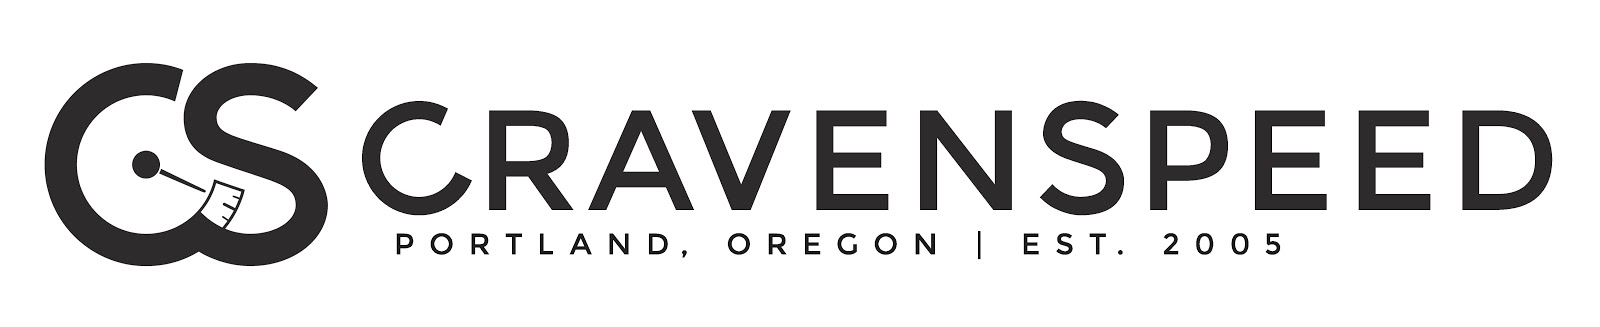 CravenSpeed - Outline logo banner.jpg